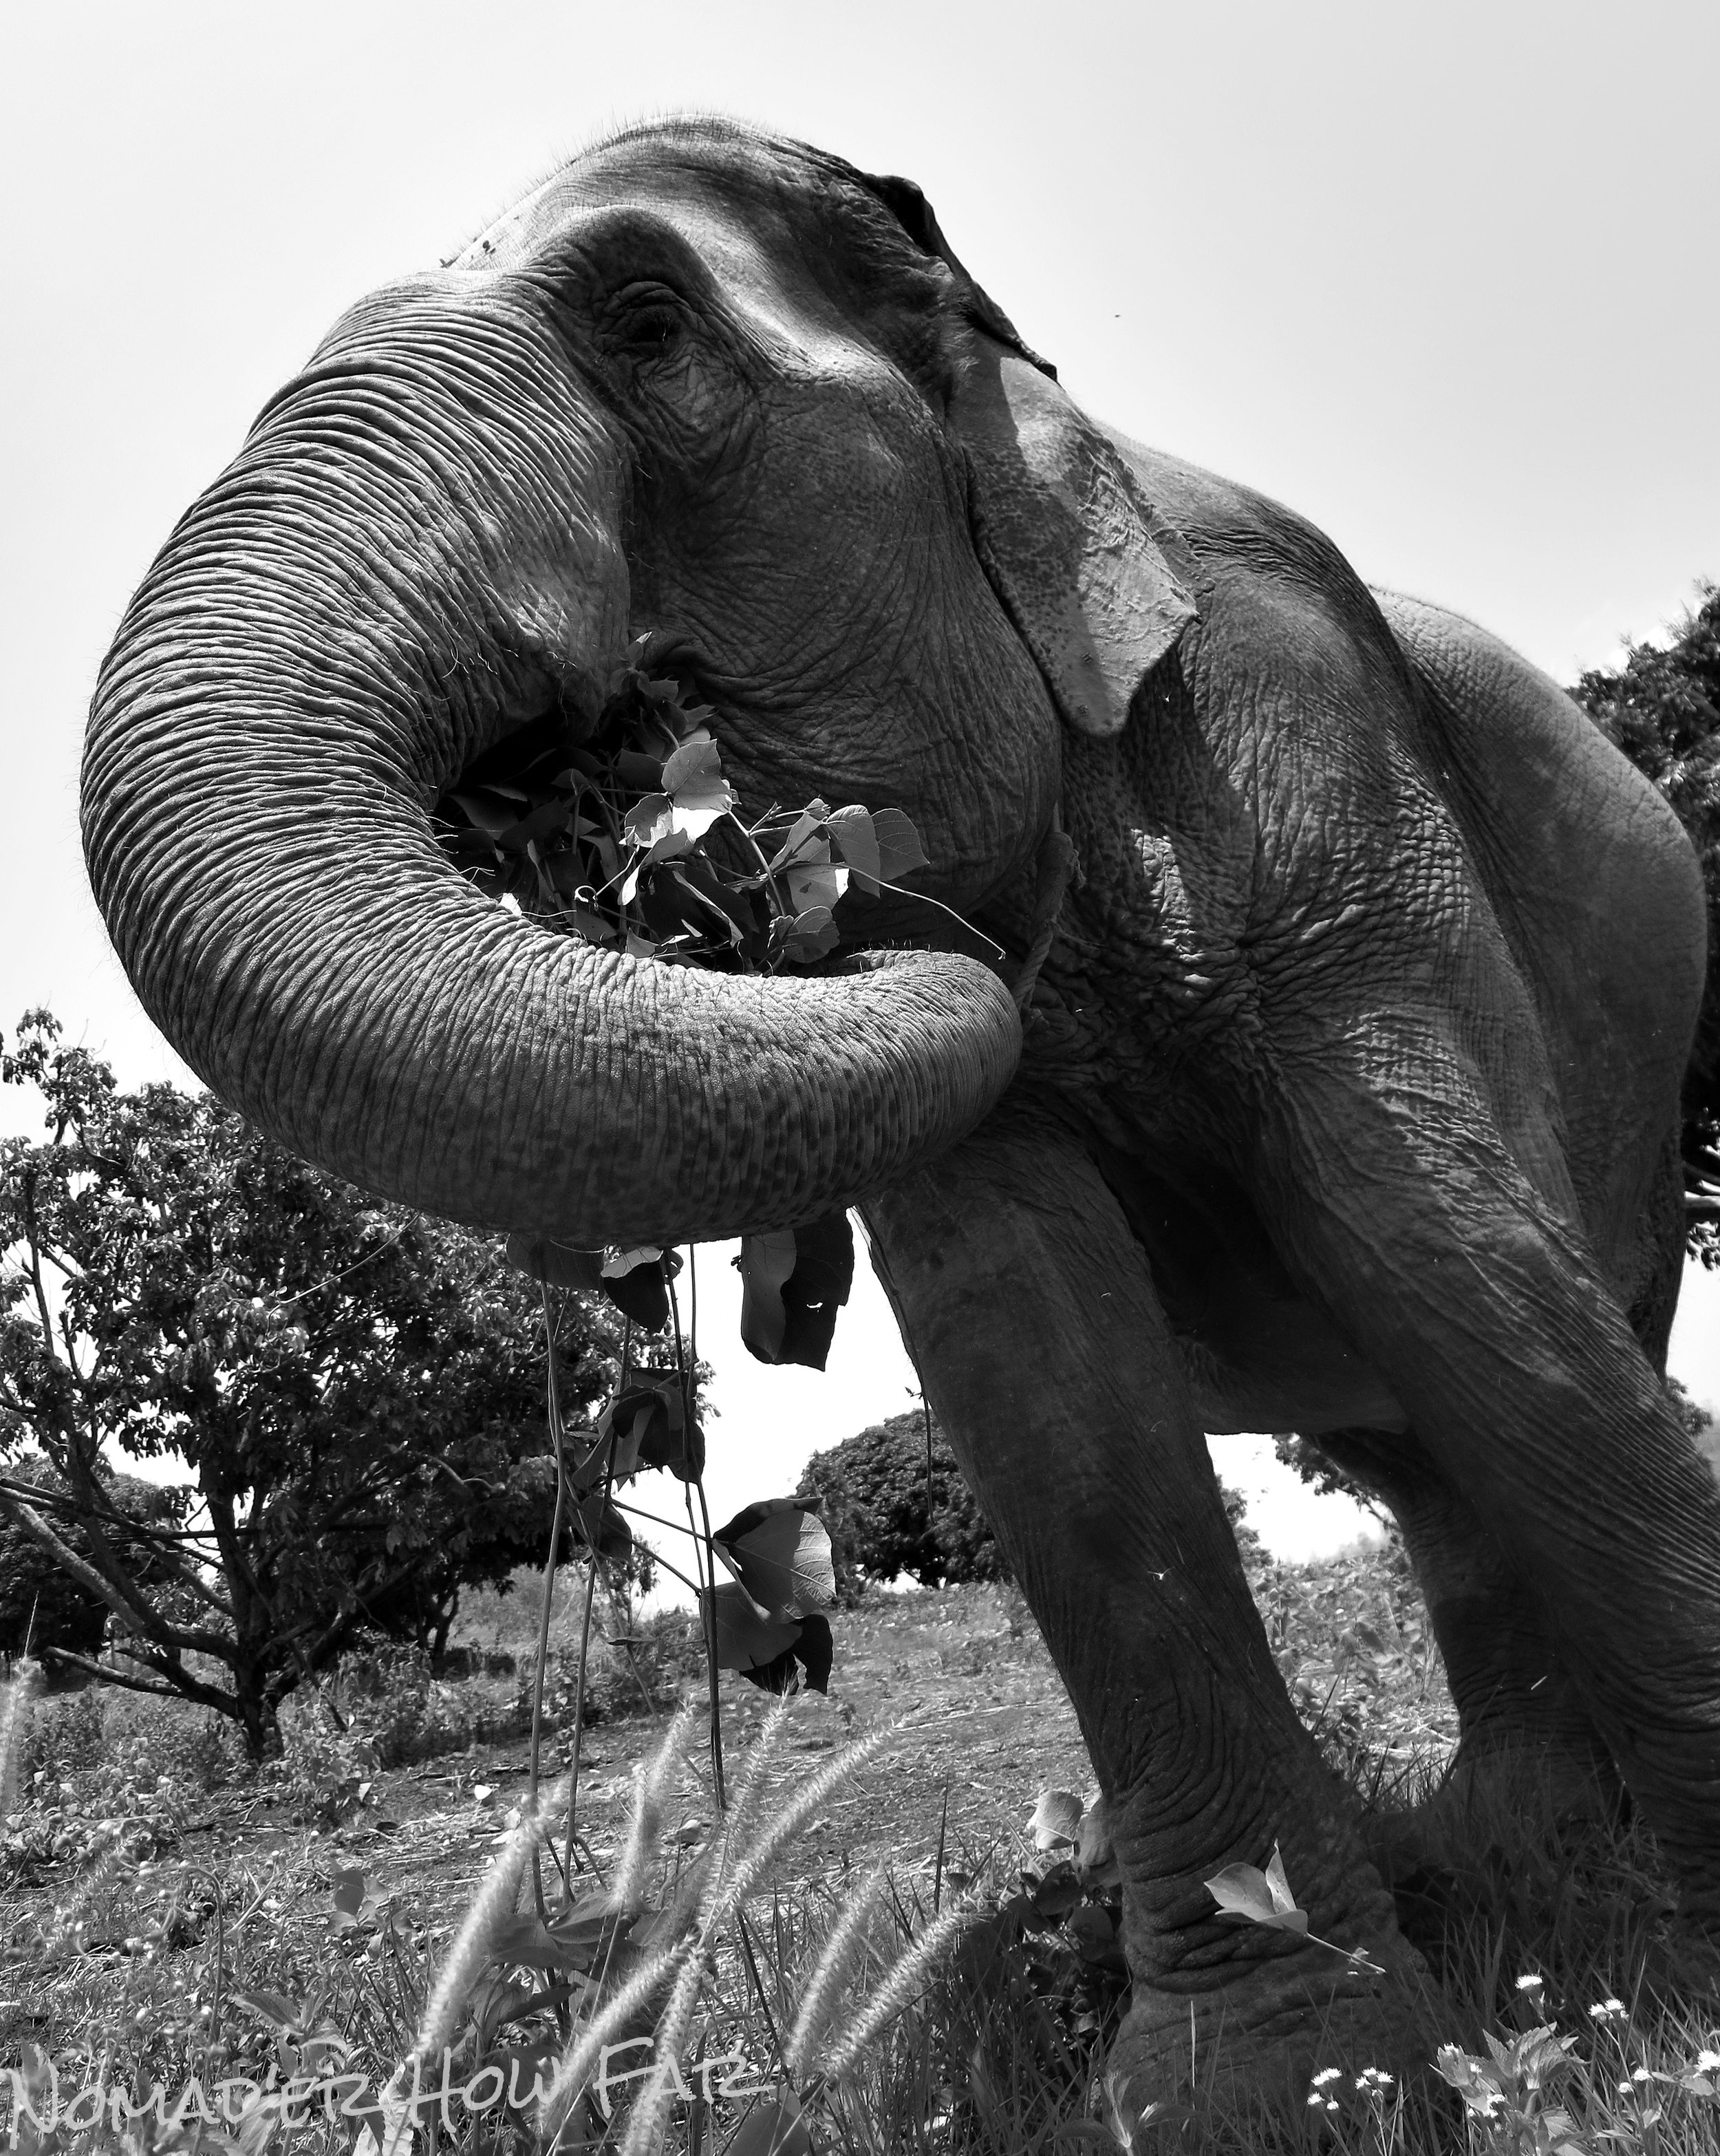 Elephant sanctuary - Chiang Mai, Thailand